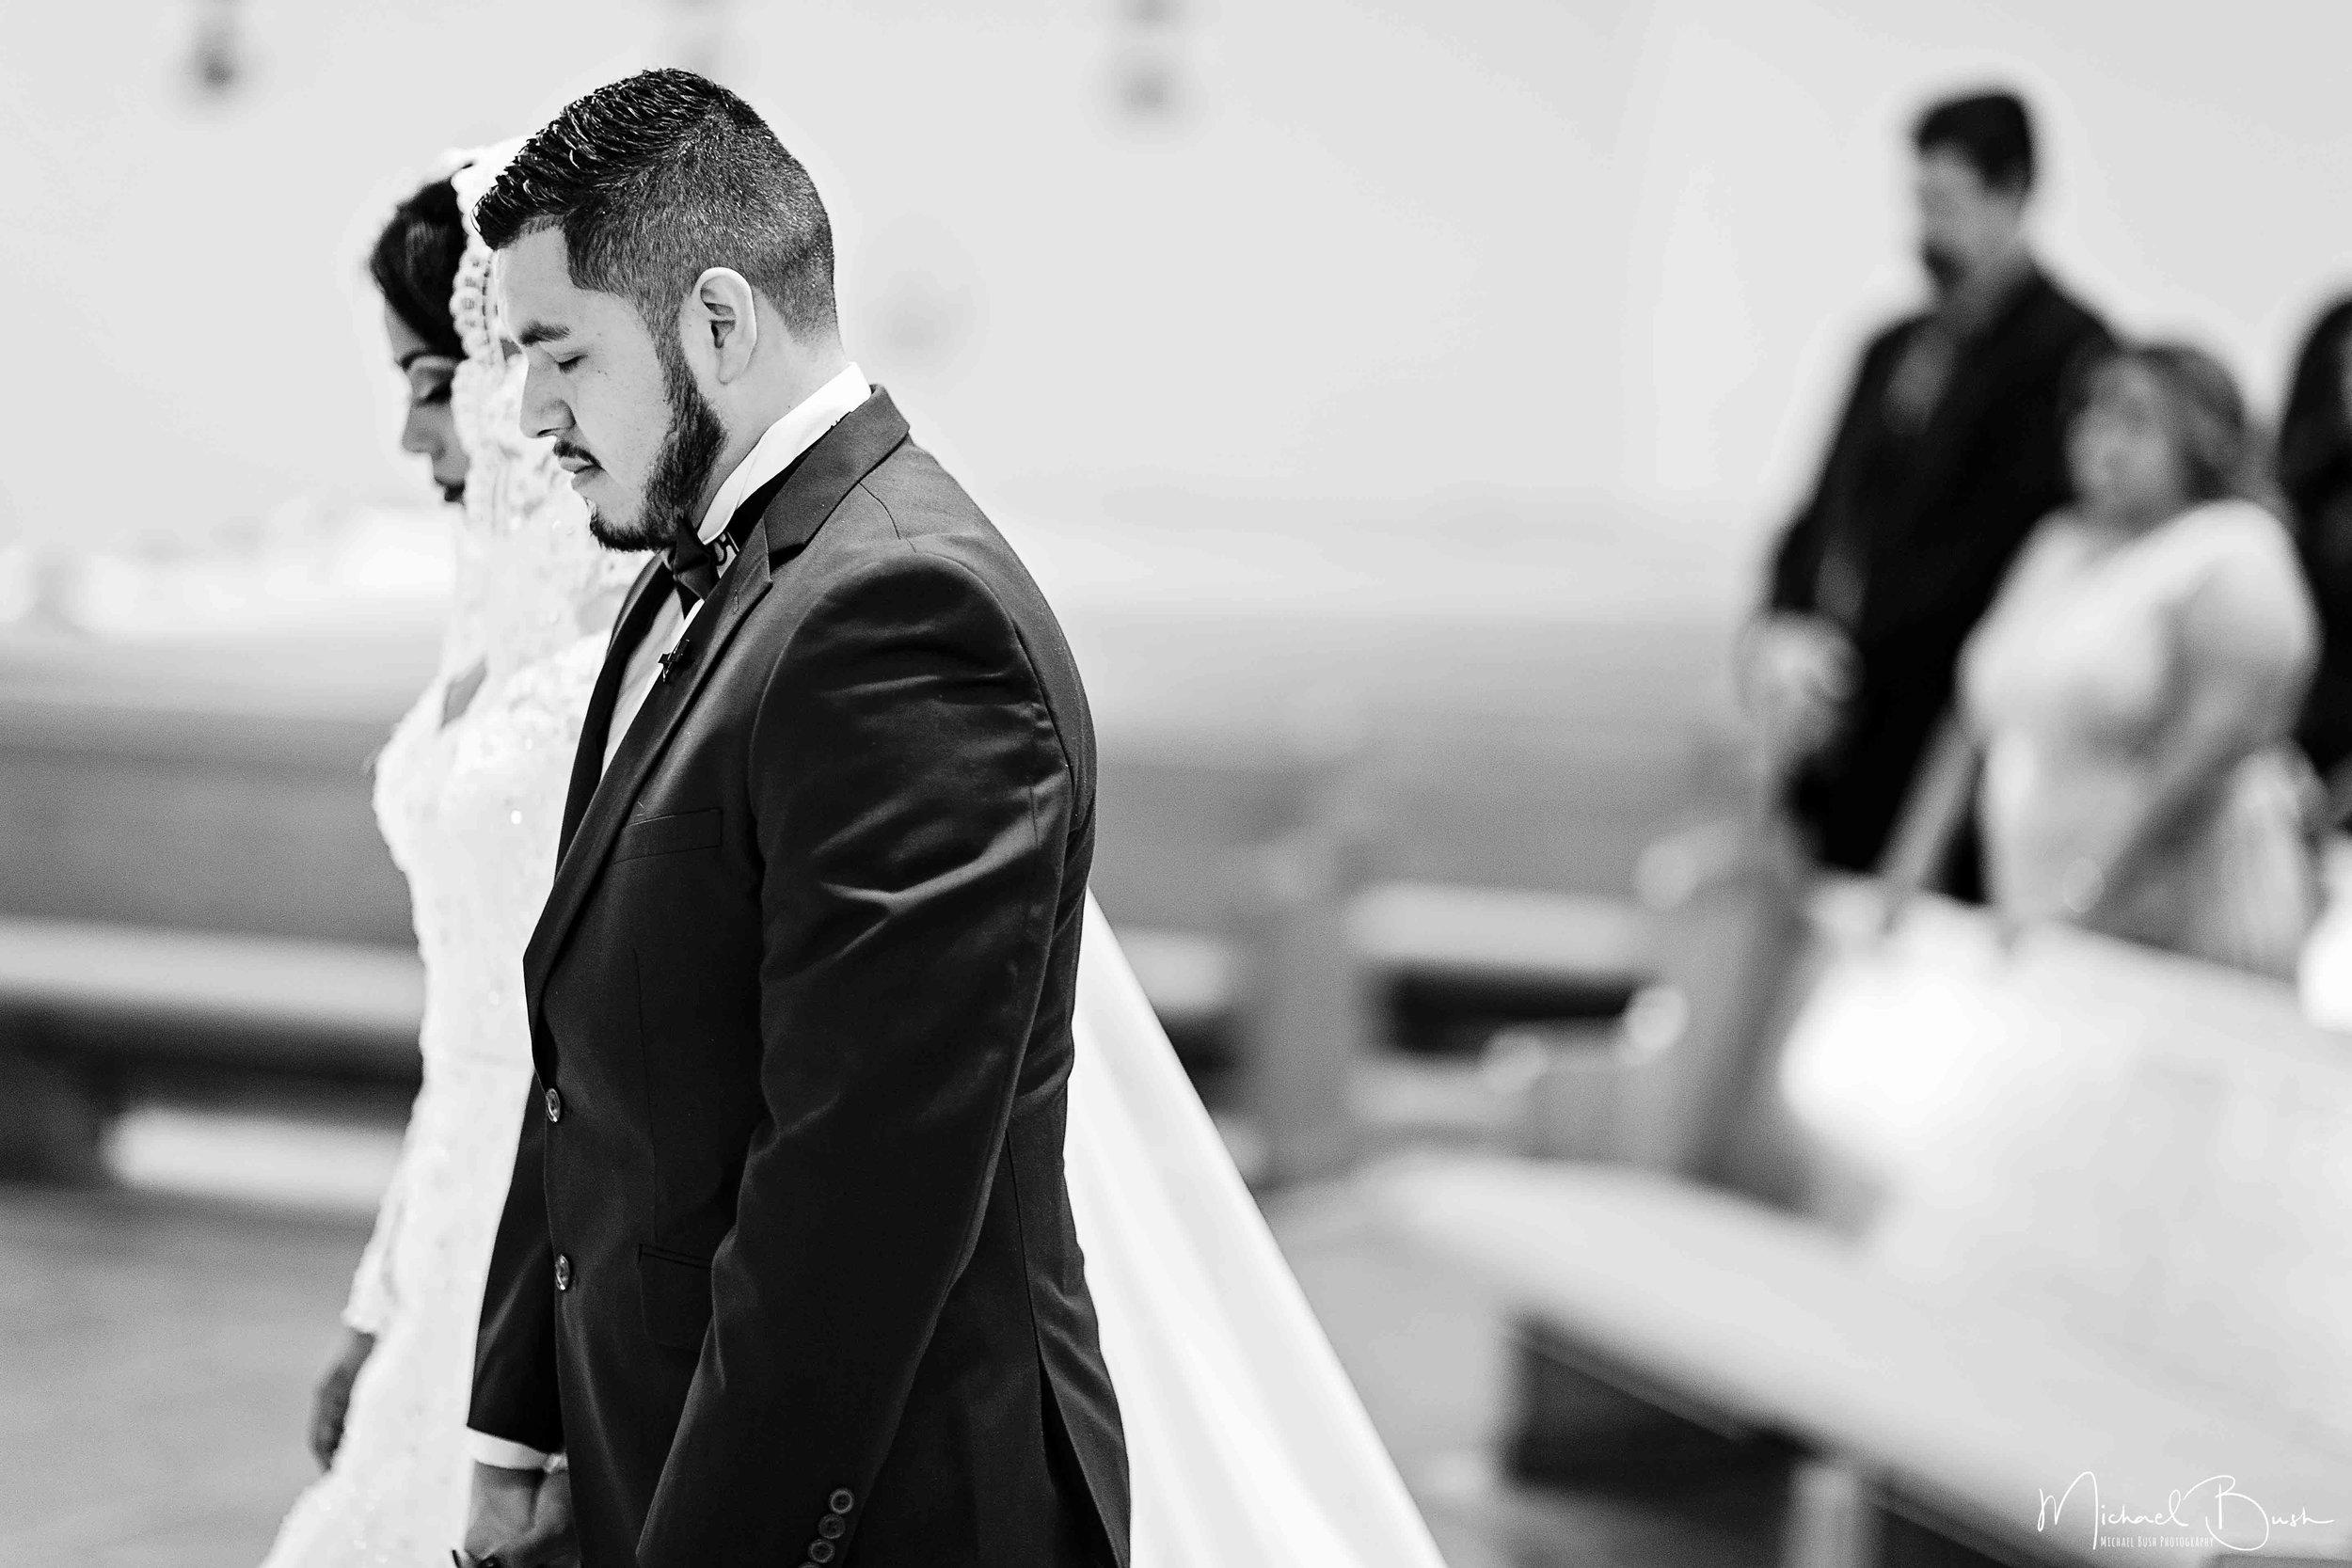 Wedding-Details-Bride-Fort Worth-colors-Ceremony-weddingceremony-brides-groom.jpg